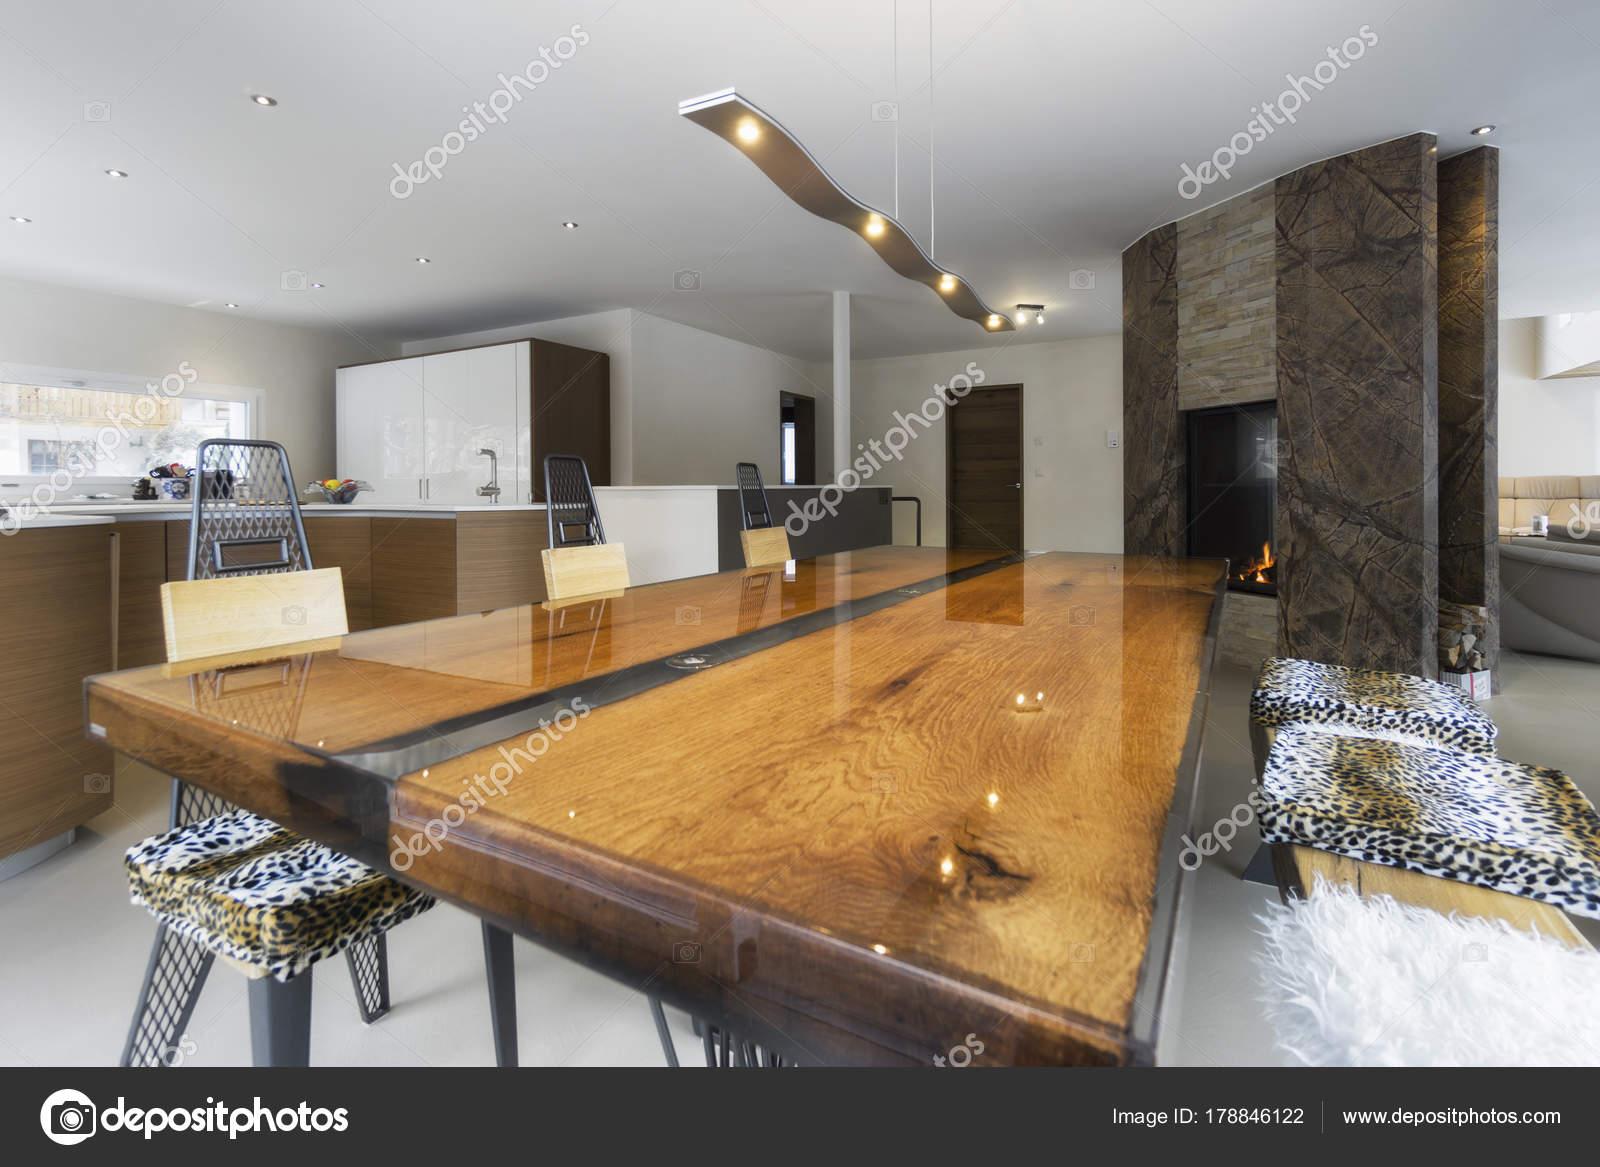 Houten Grote Tafel.Grote Keuken En Antieke Houten Tafel In Moderne Stijl Stockfoto